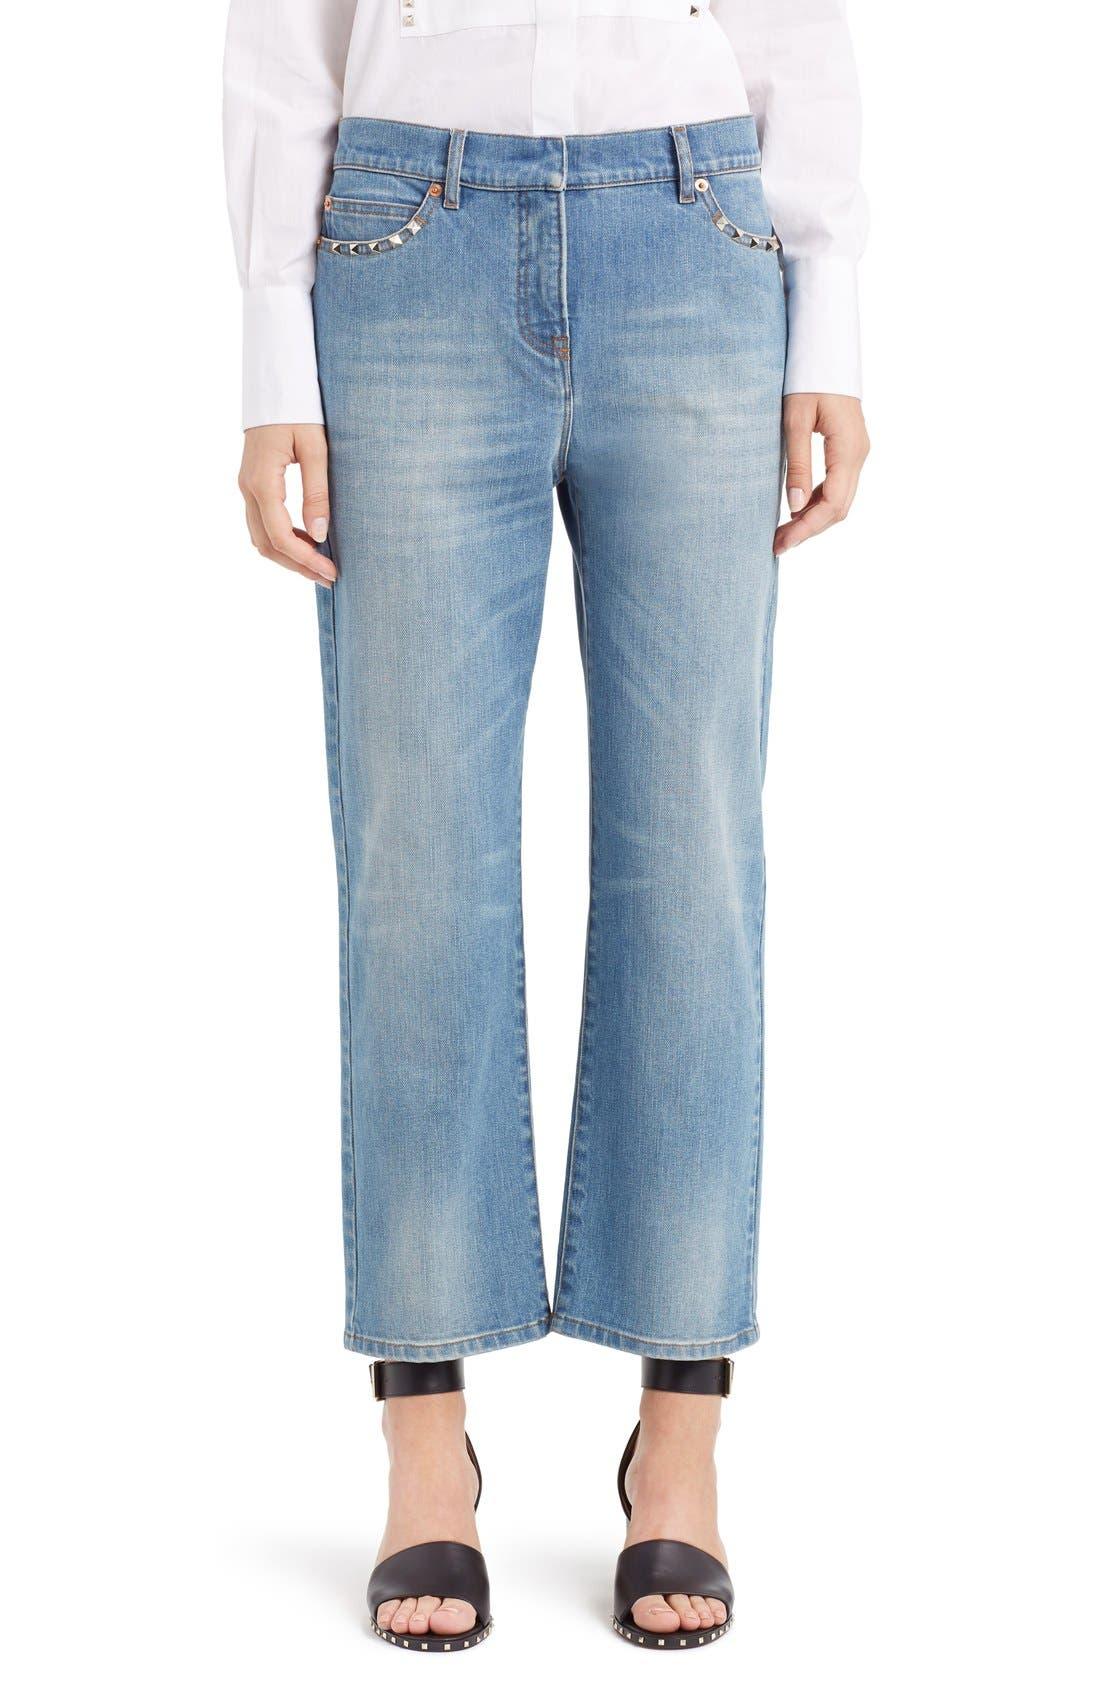 Valentino Rockstud Boyfriend Jeans